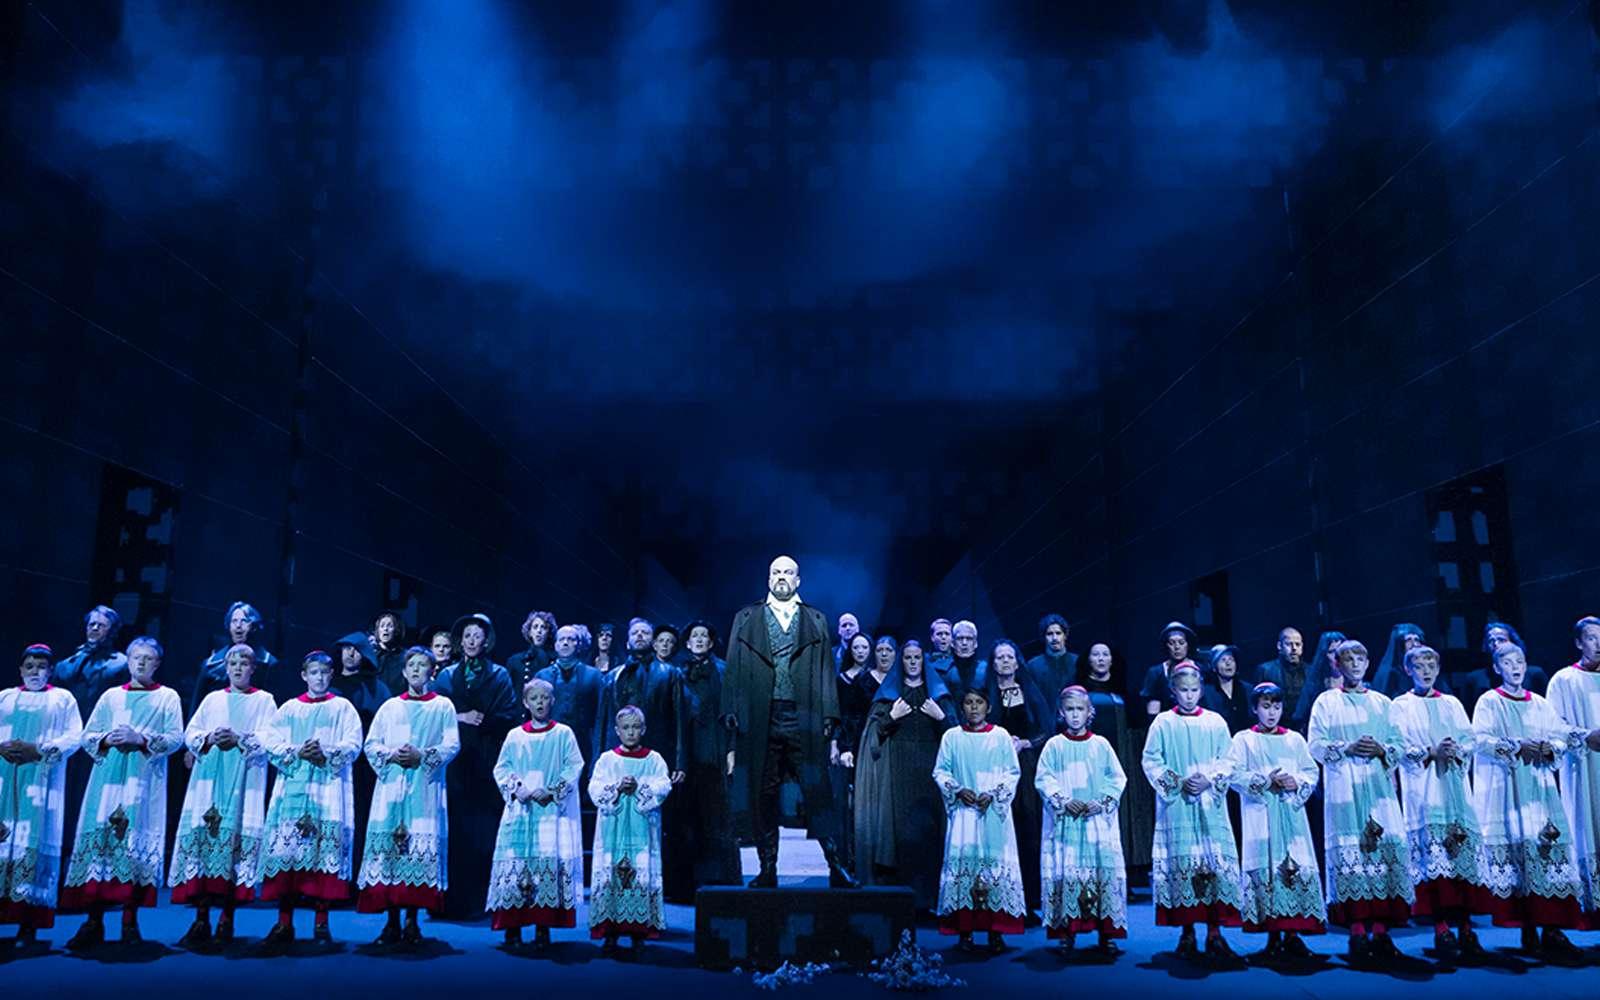 kgl teater opera